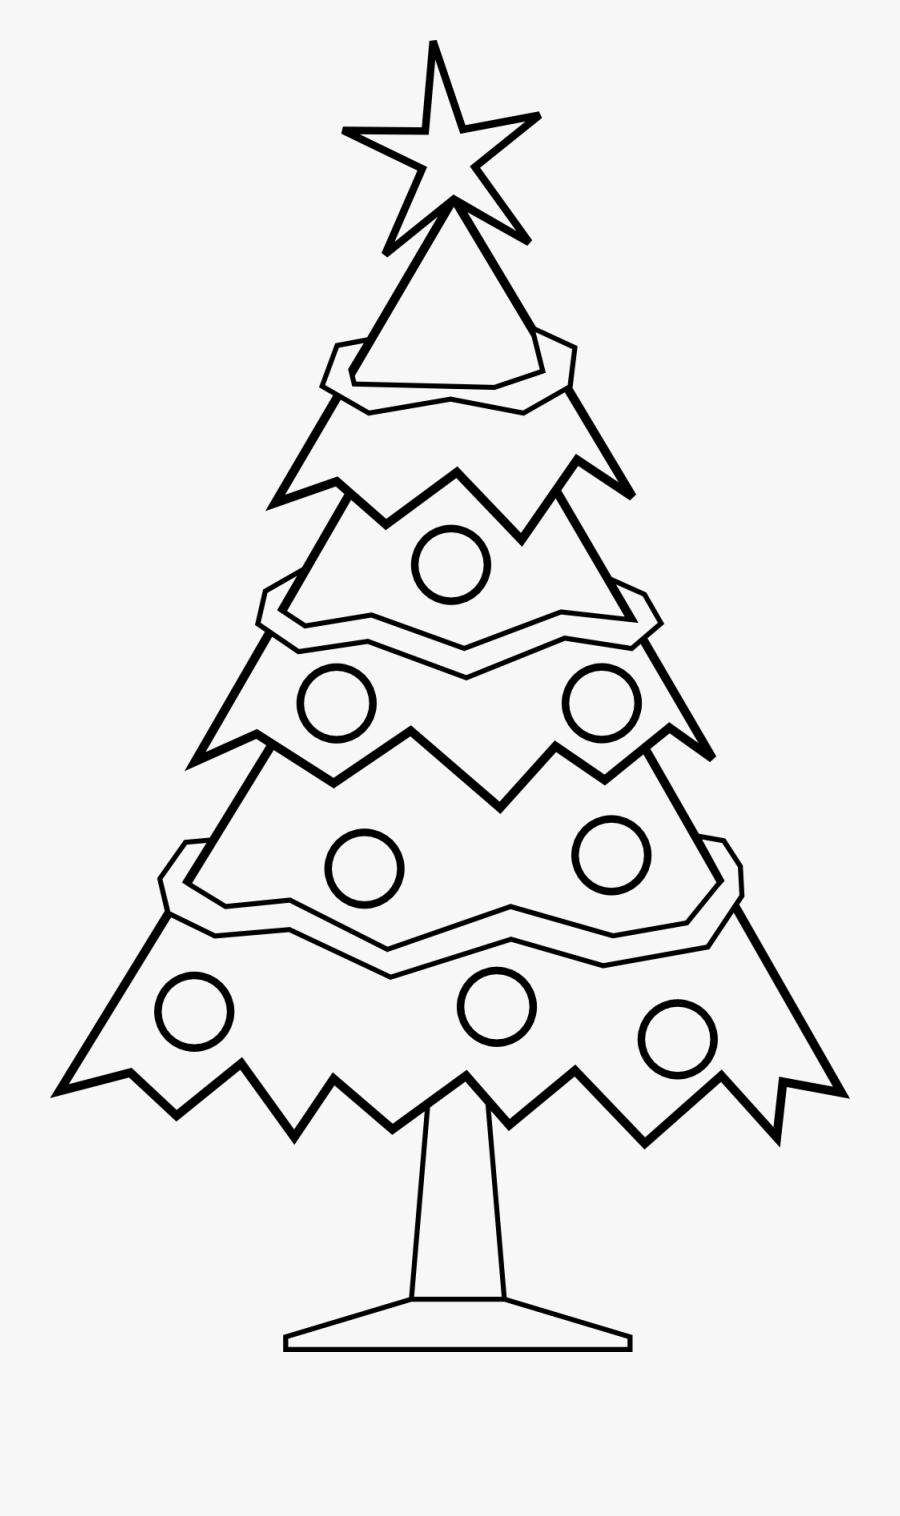 Thumb Image - Xmas Tree Clipart Black And White, Transparent Clipart